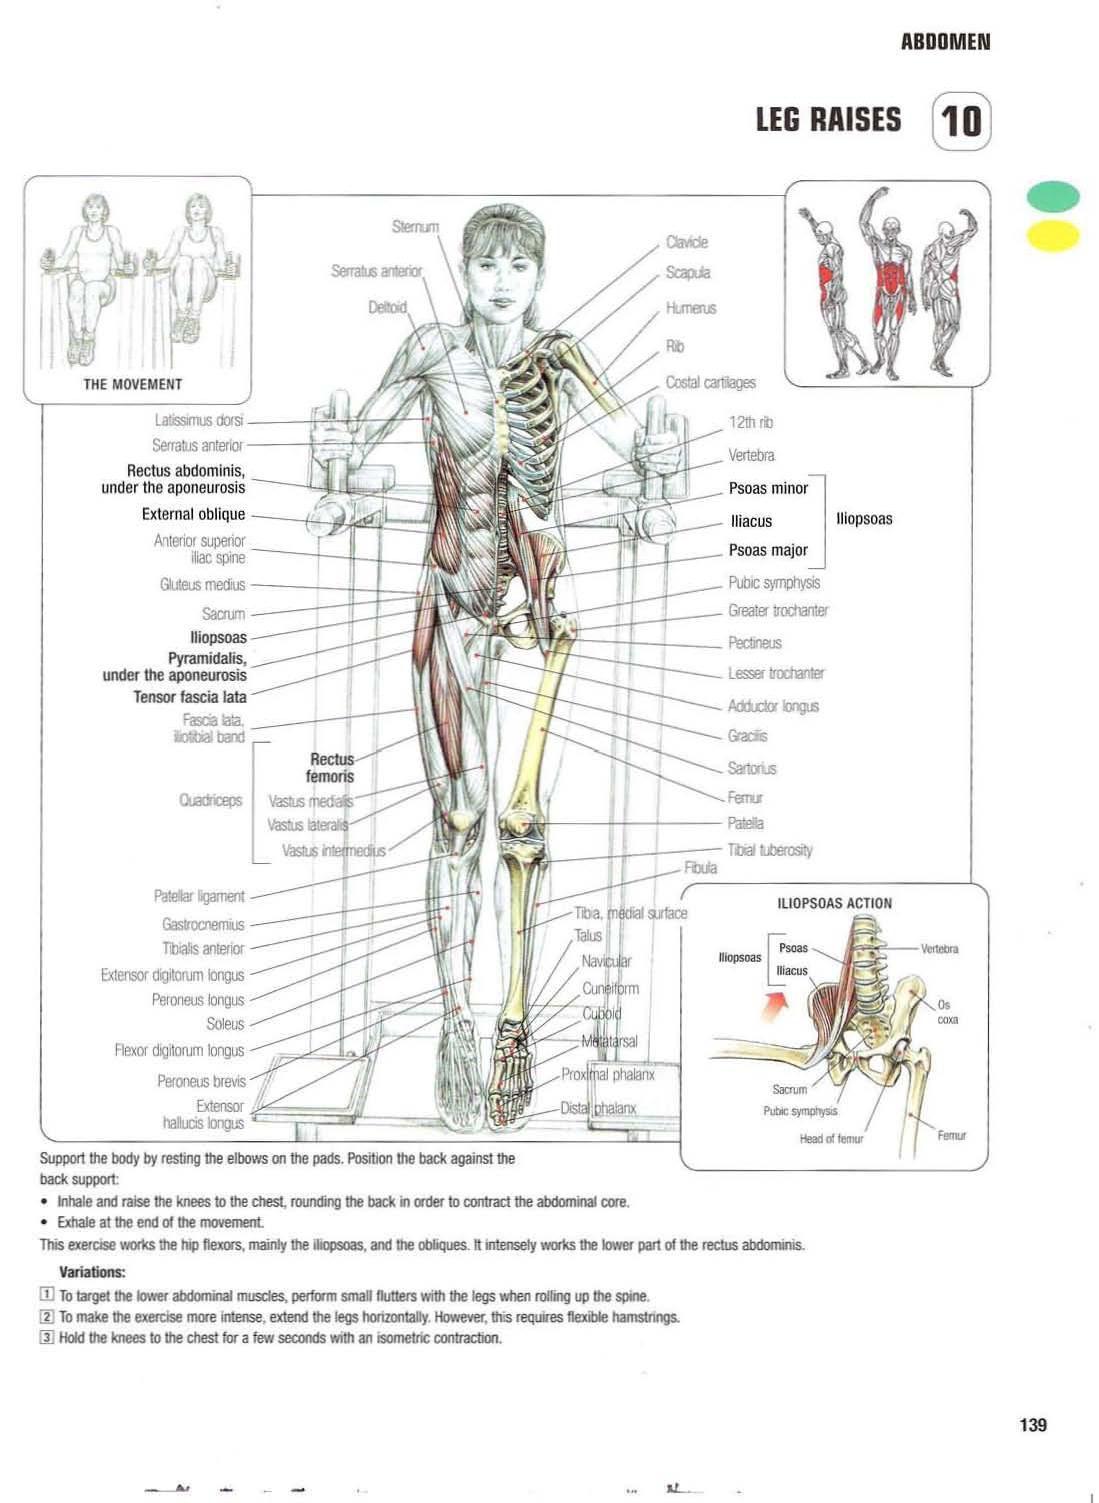 Strength Training Anatomy 10 Leg Raises Abs Core Six Pack Flat